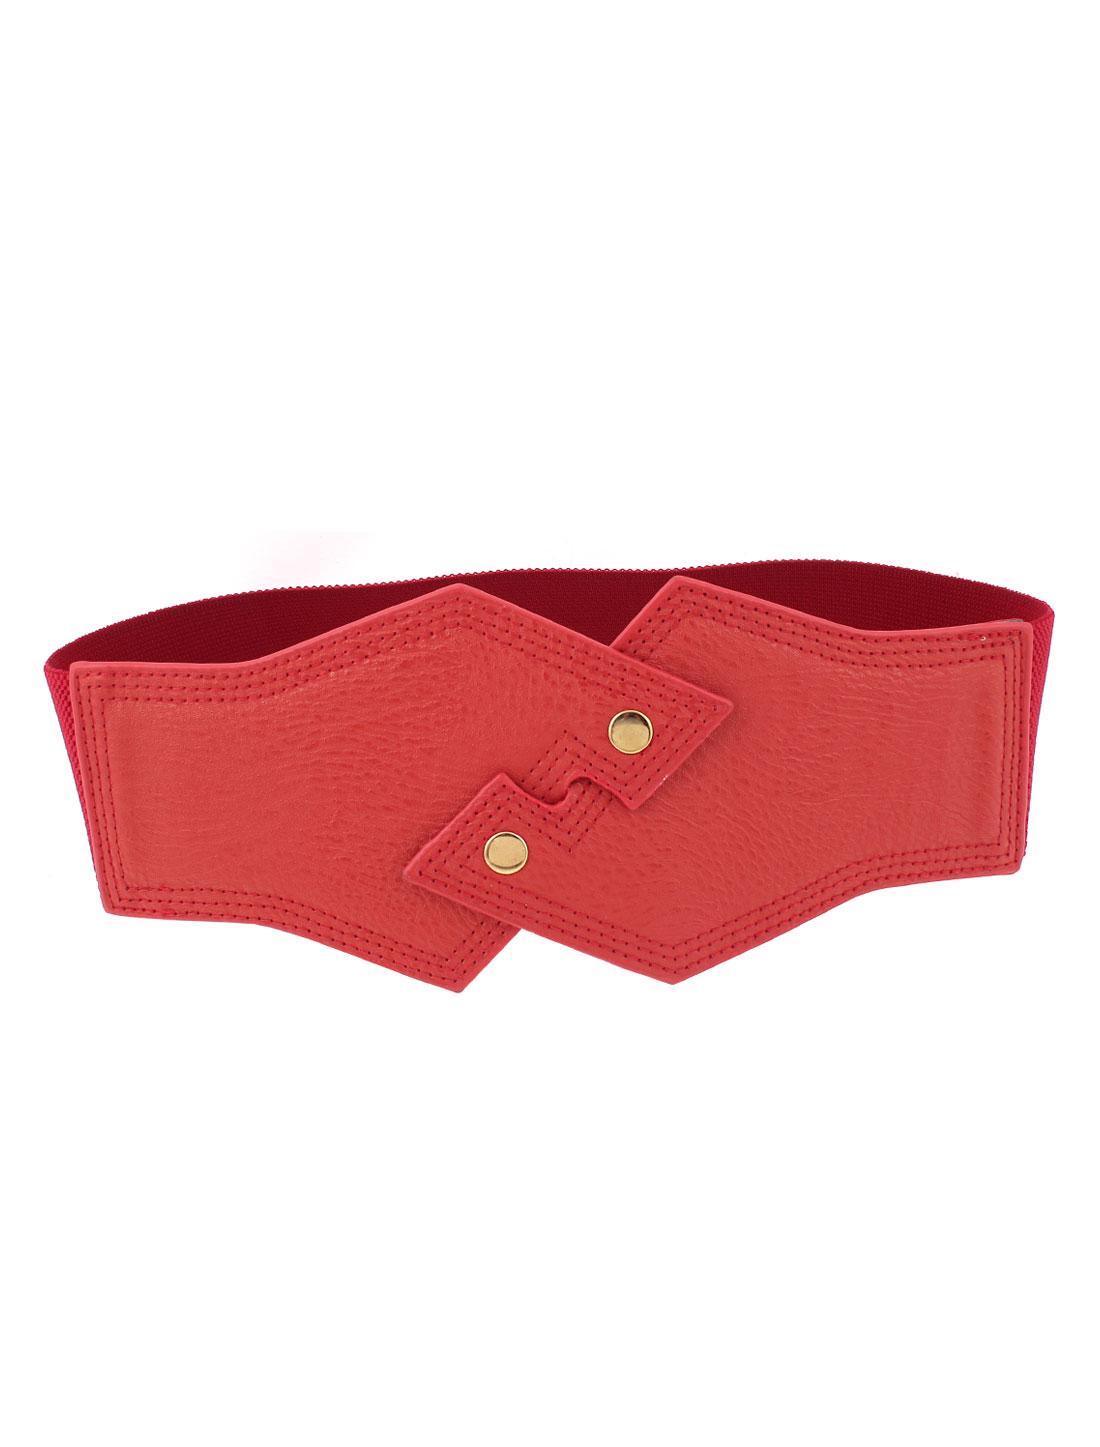 Lady Faux Leather Interlock Buckle Elastic Waist Belt Waistband Red